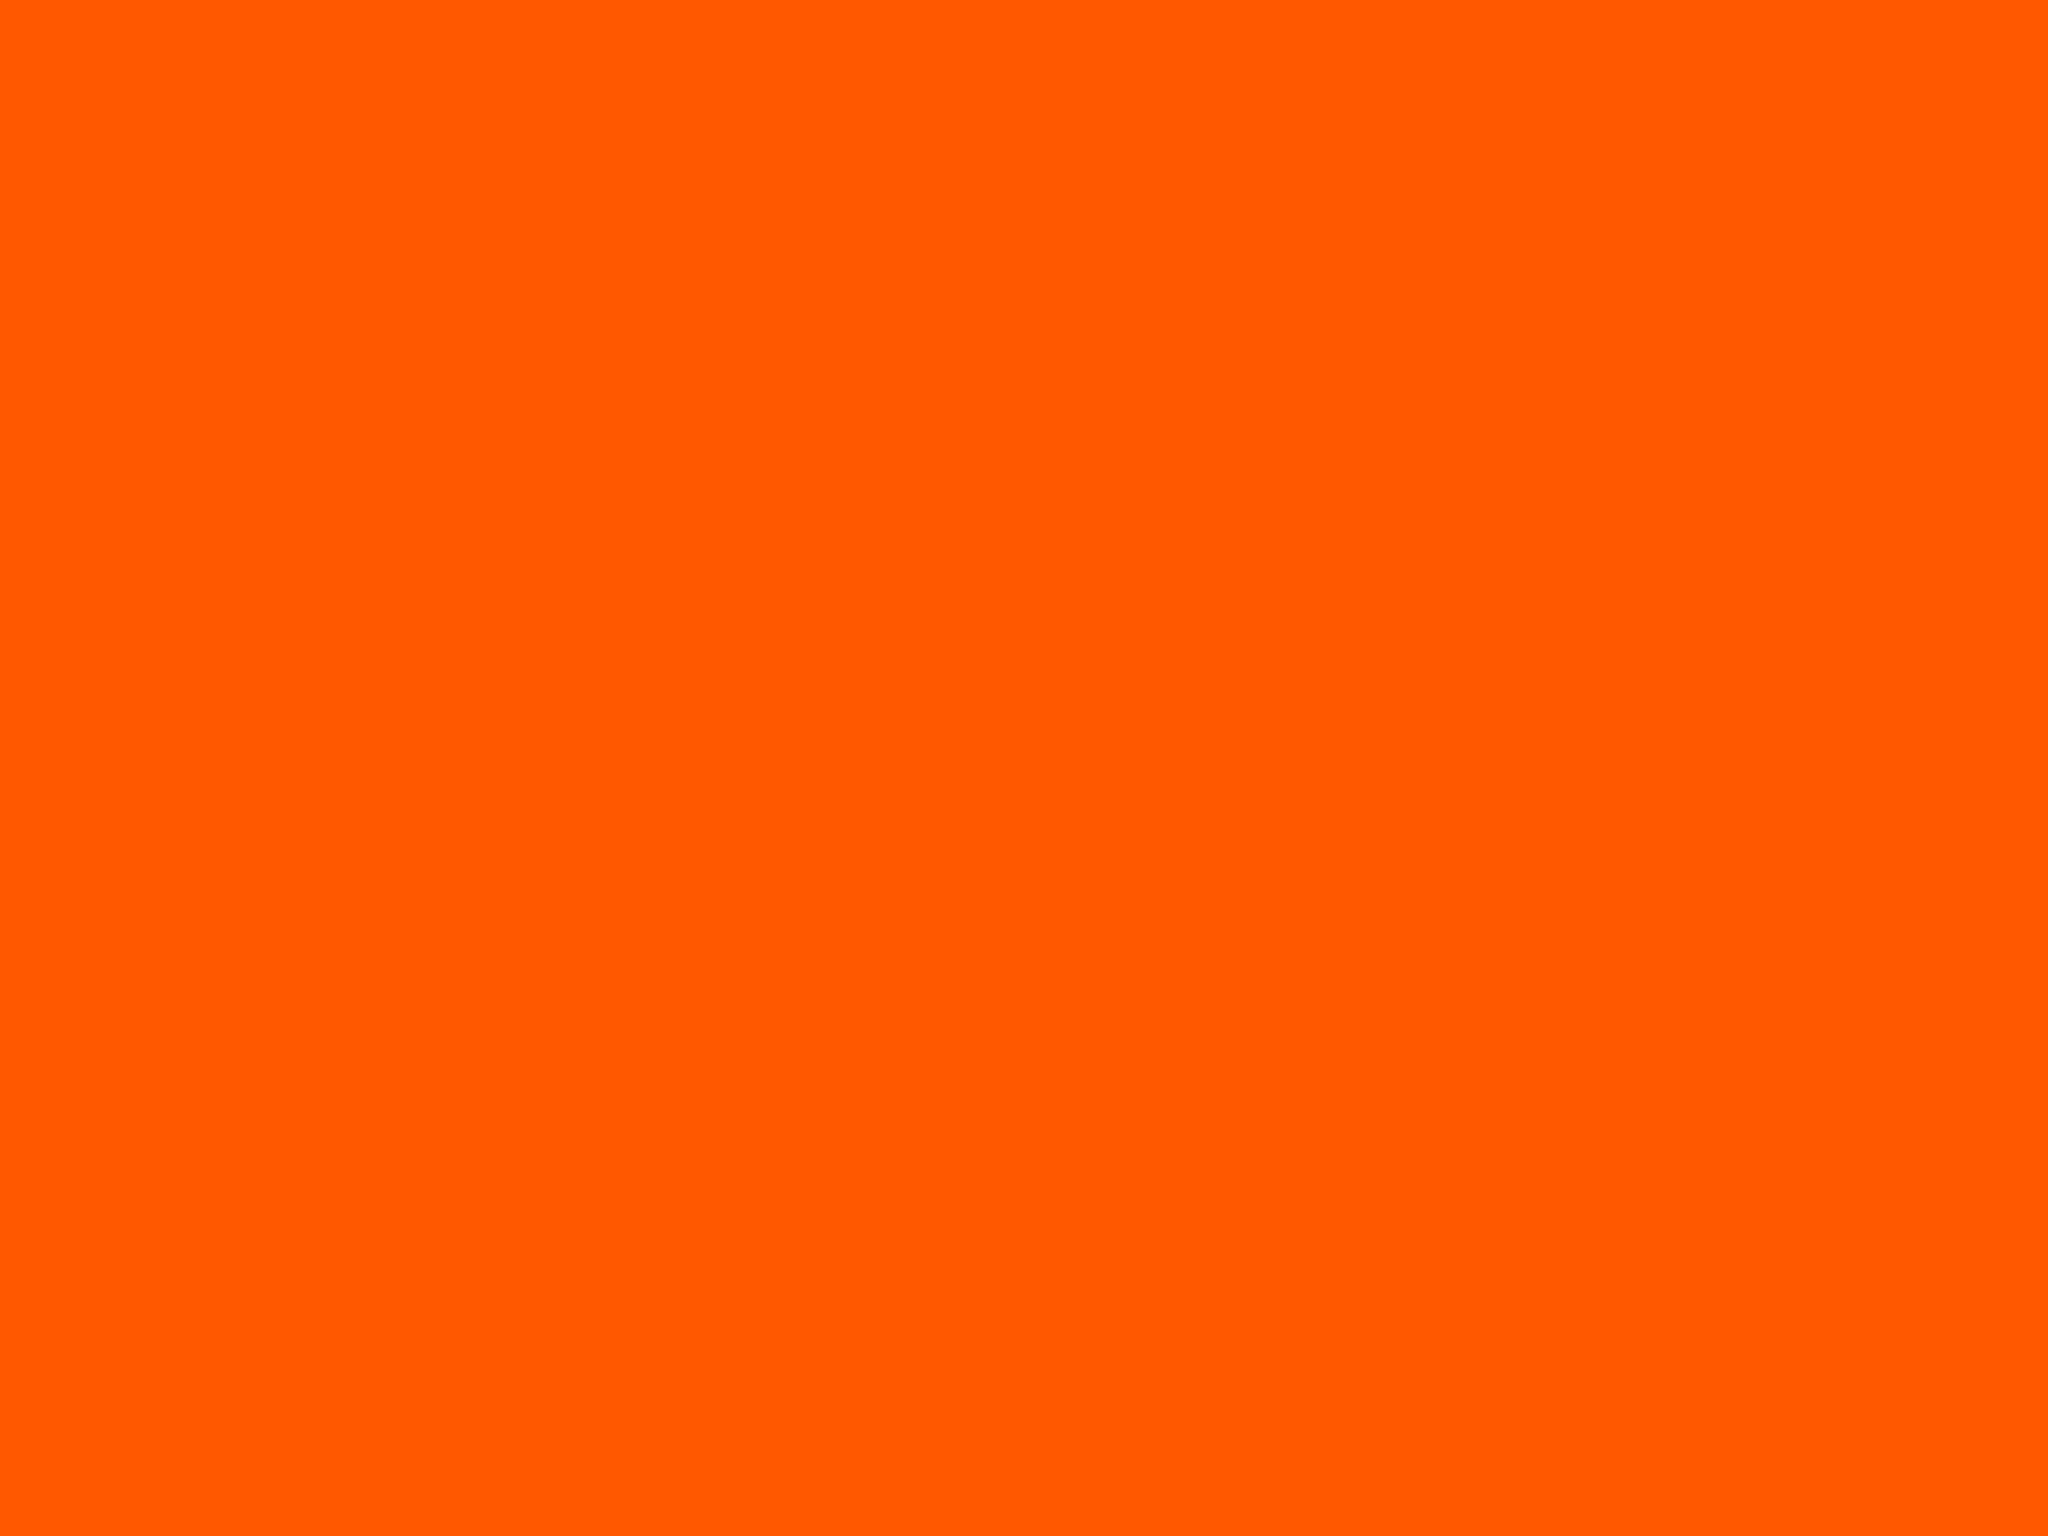 2048x1536 Orange Pantone Solid Color Background